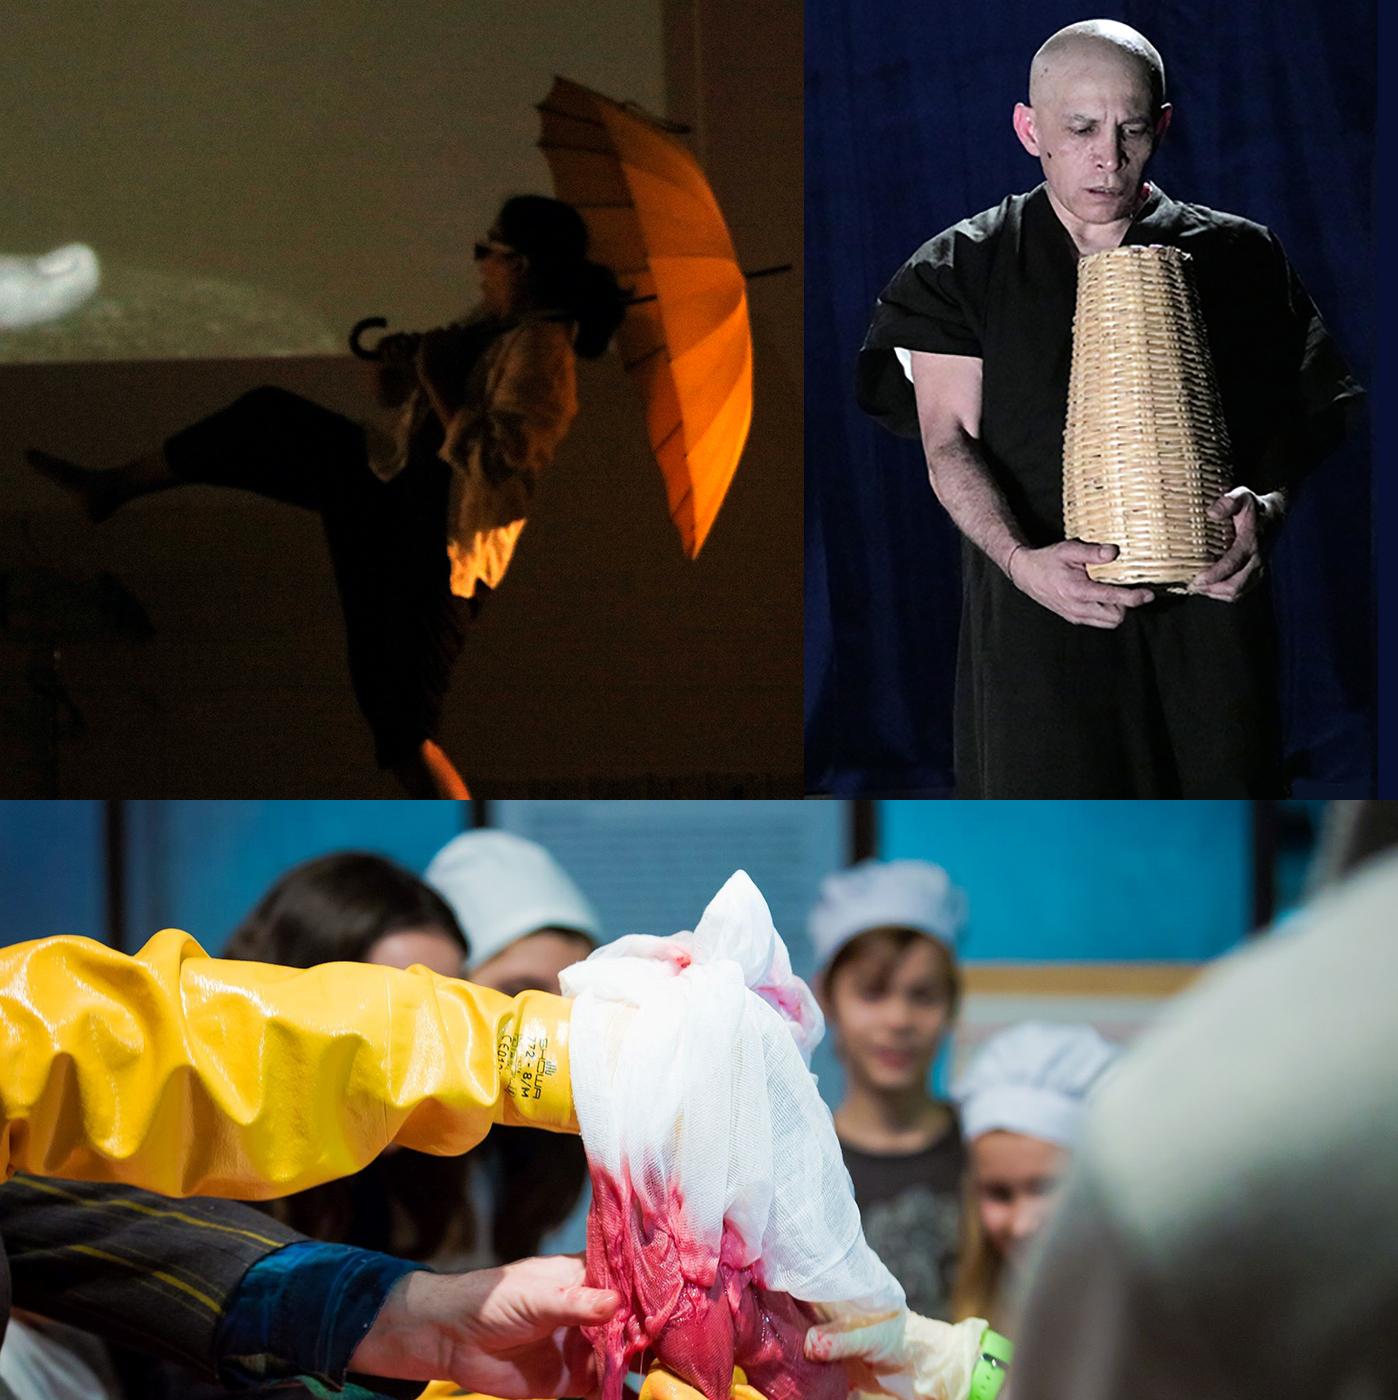 ARTIST SALON - Tuesday, April 167:30 pm to midnightMothership Salon @ Last Frontier NYC: DANCE | PERFORMANCE | BIOART▪ Aastha Gandhi, PhD Dancer/Choreographer (India)▪ Dalila Honorato, PhD Social Scientist (Portugal/Greece) ▪ Adam Zaretsky, PhD Bio Artist (US)▪ Hector Canonge, Performance Artist & Curator (Argentina/US)